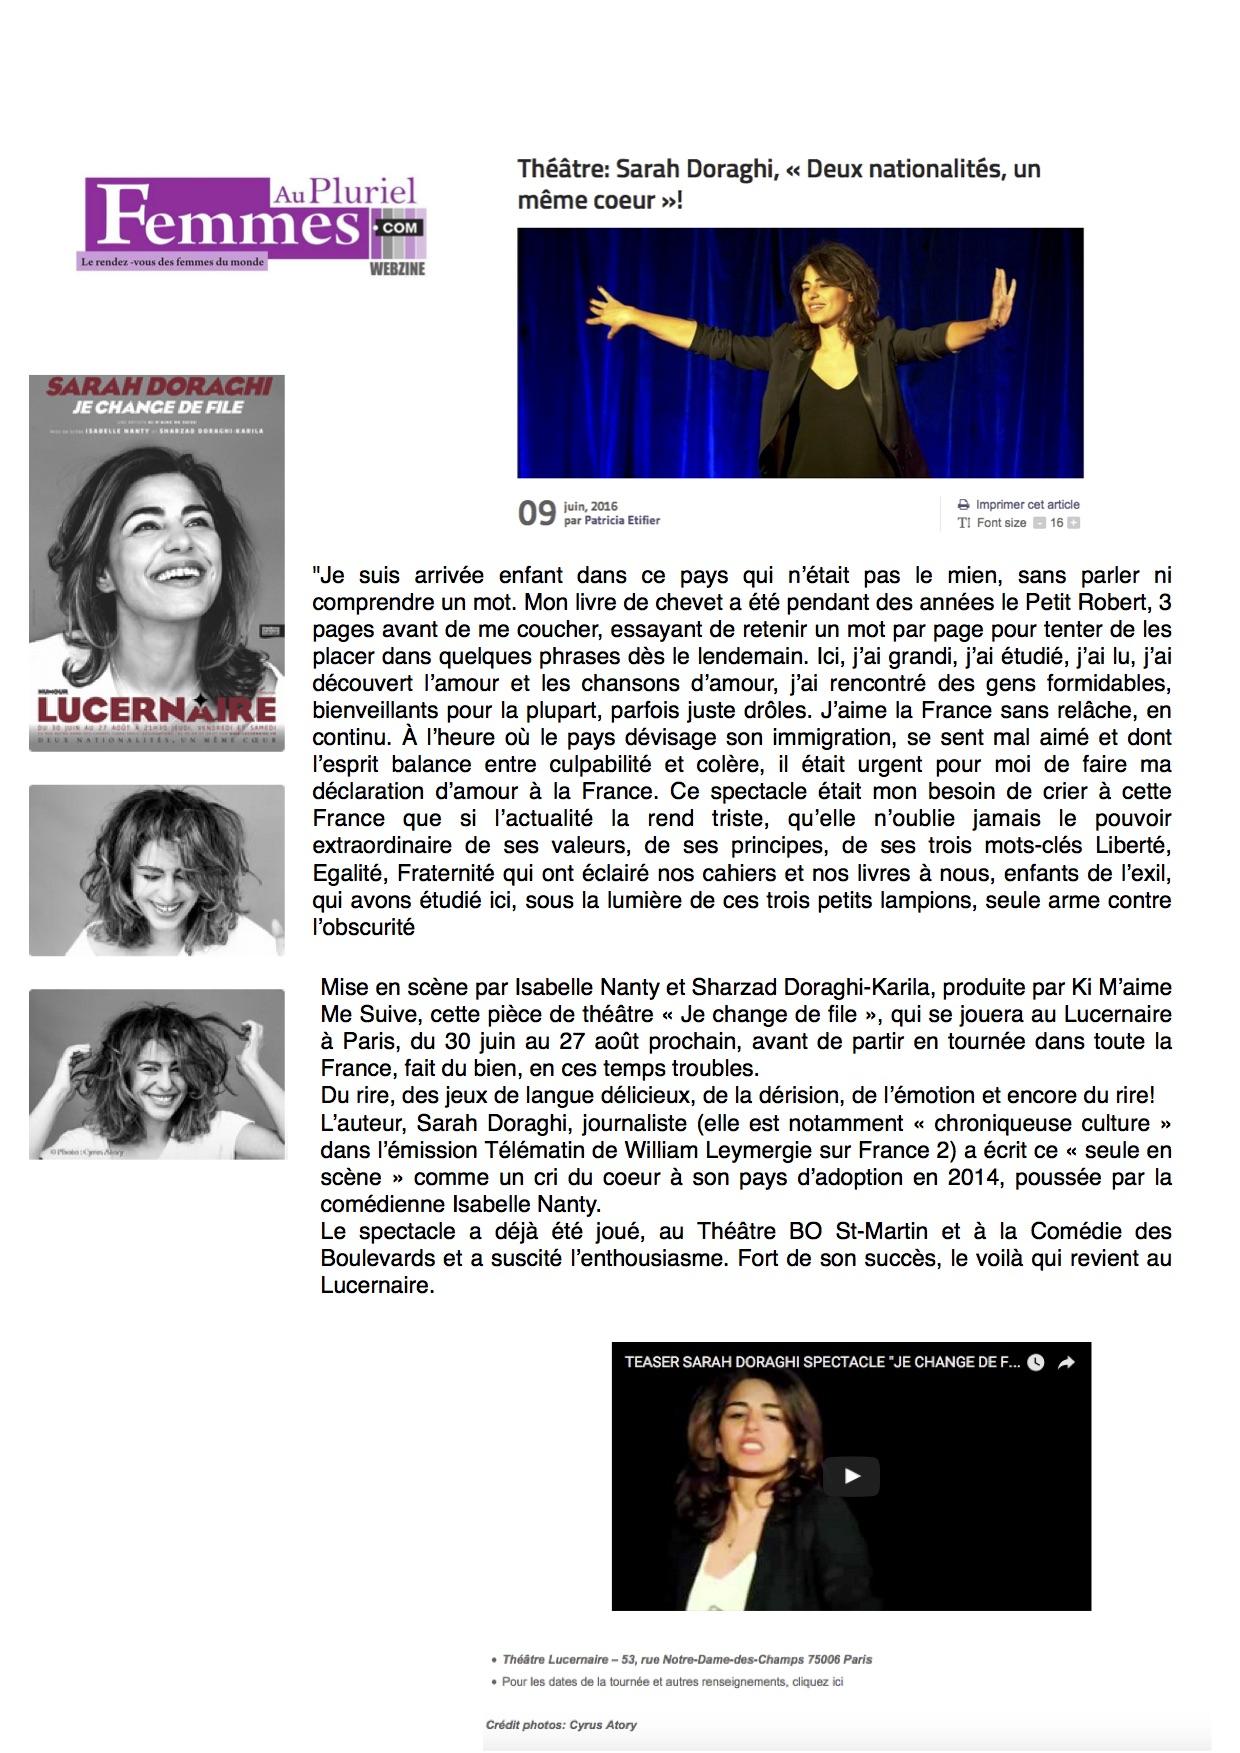 Femmeaupluriel.com 06.06.16